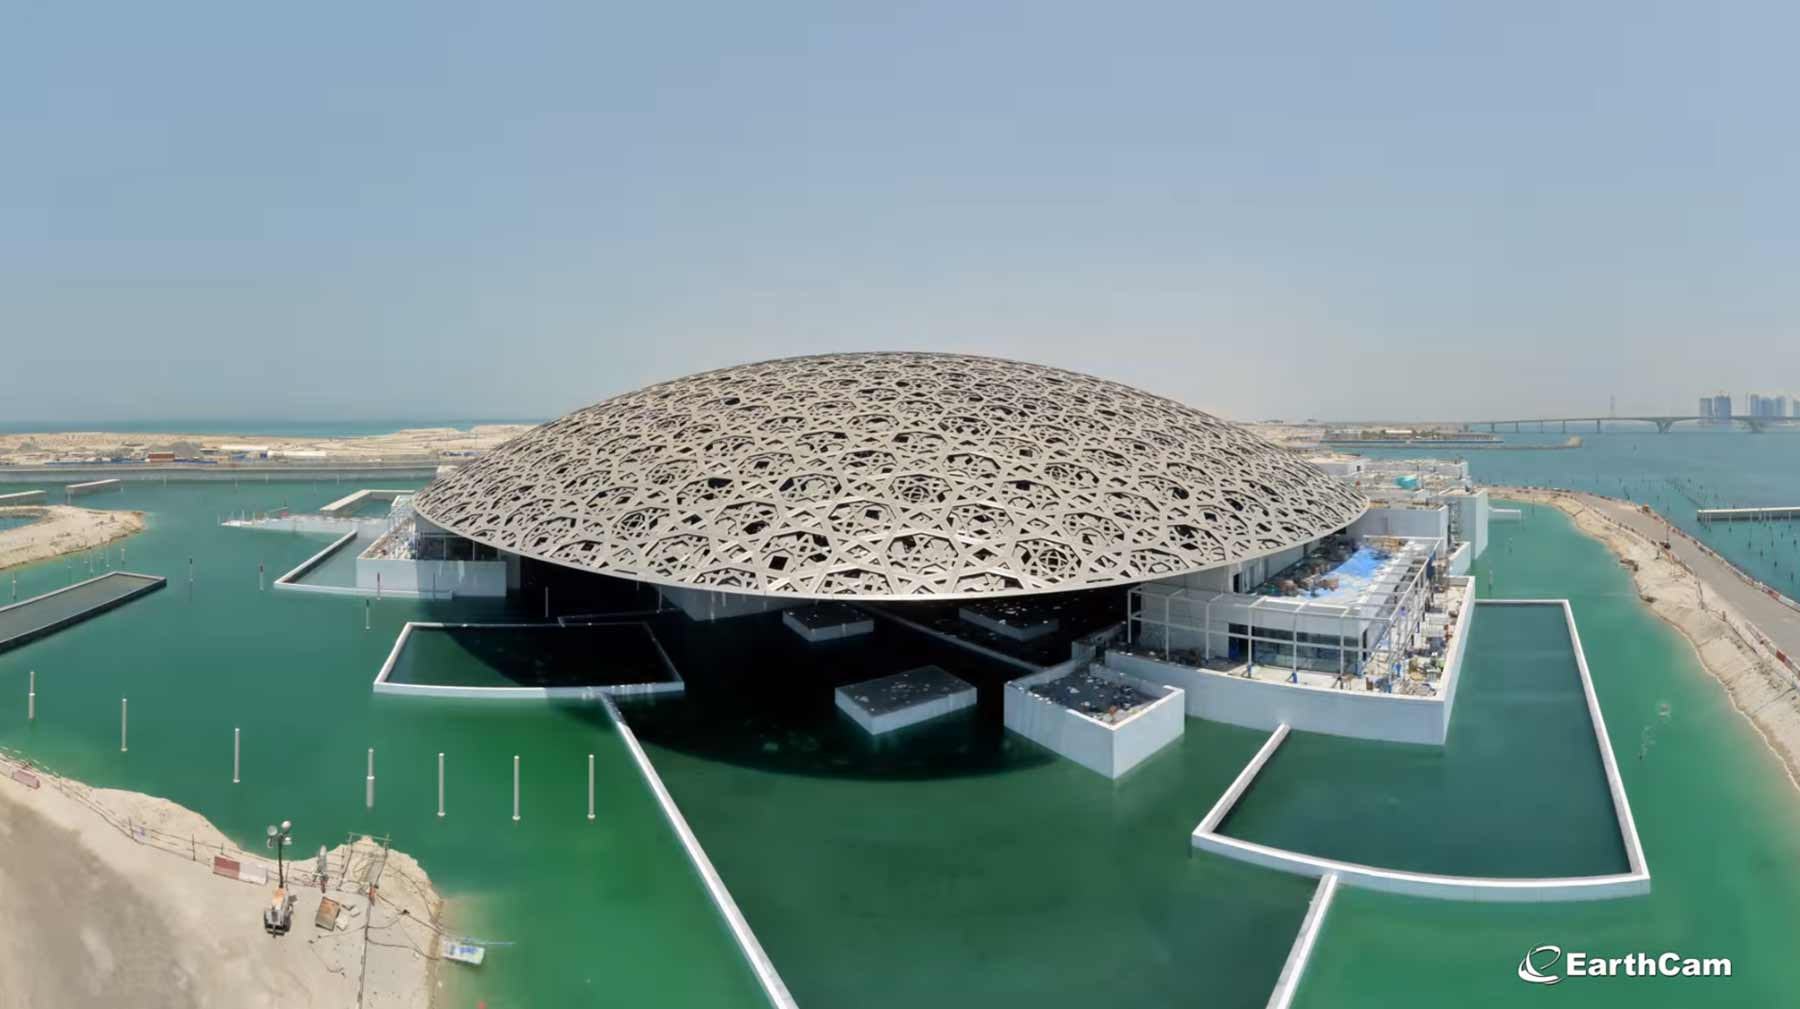 Timelapse: Der achtjährige Bau des Louvre Abu Dhabi